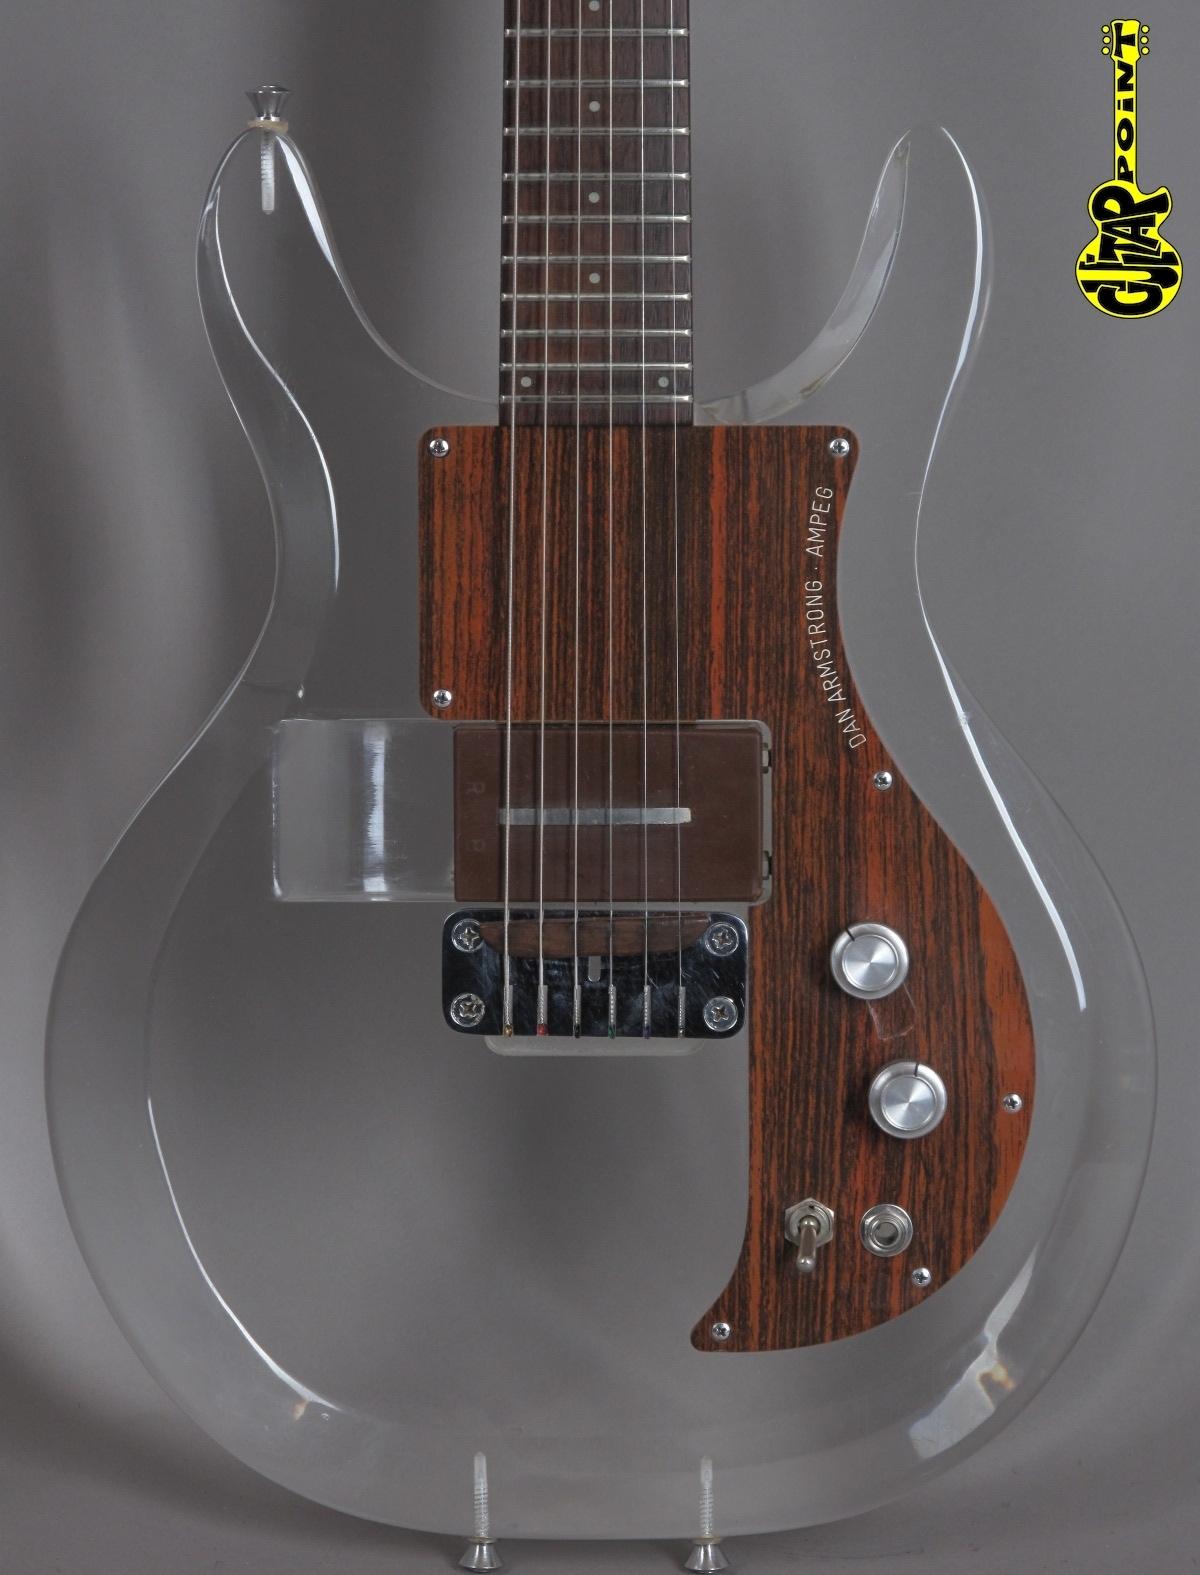 1970 Dan Armstrong (Ampeg) Plexi/Lucite Guitar